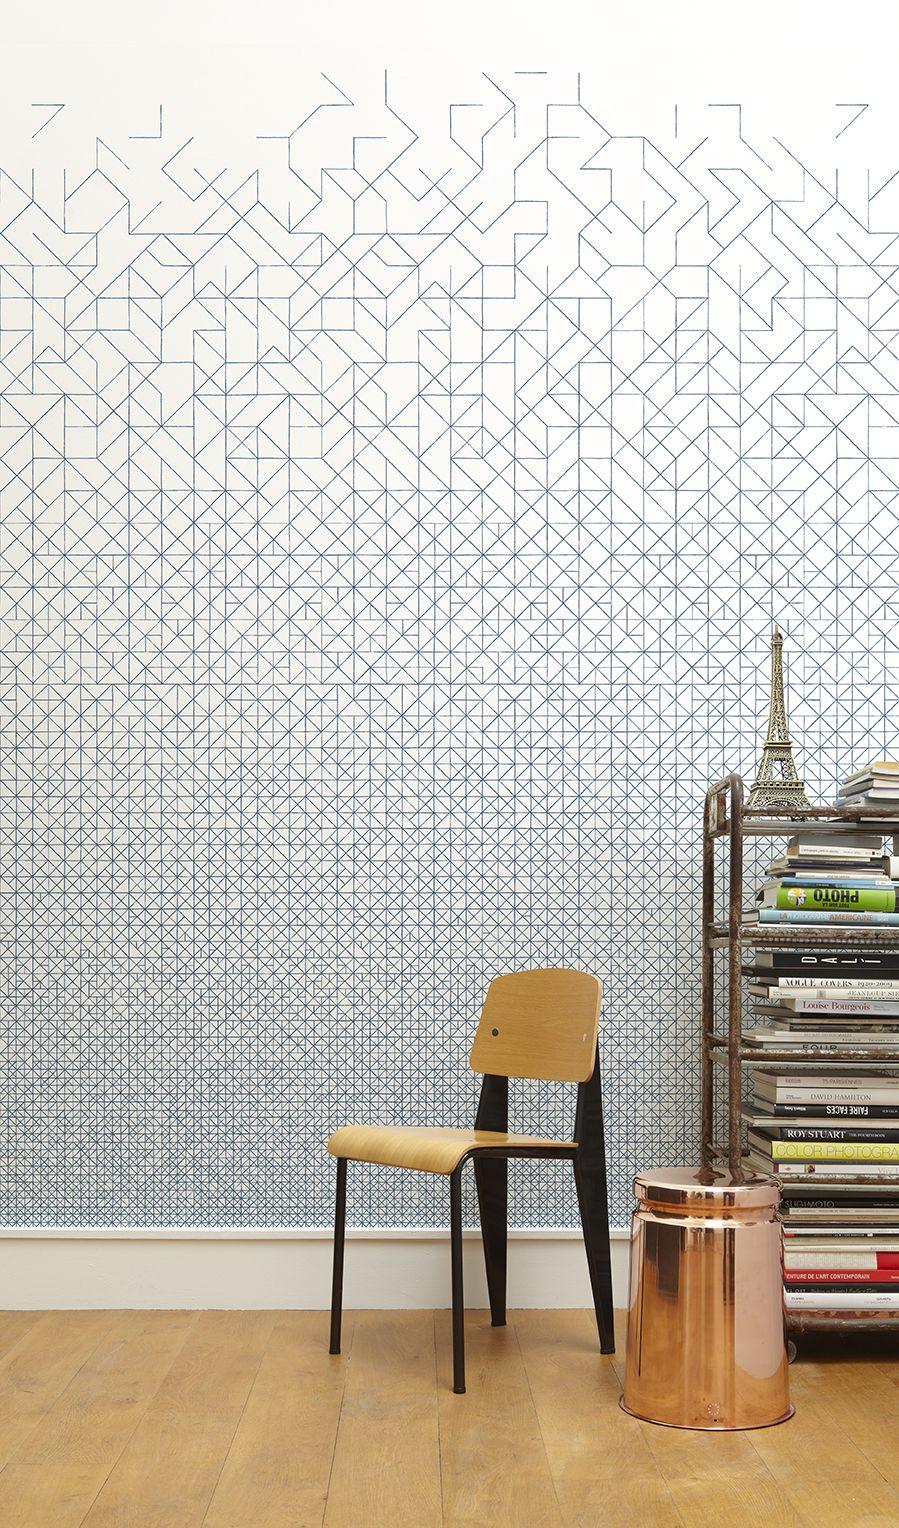 MODULAR wallpaper by MINAKANILAB www.minakanilab.com Retailer : Maison M - Paris #maisonM #minakani #wallpaper